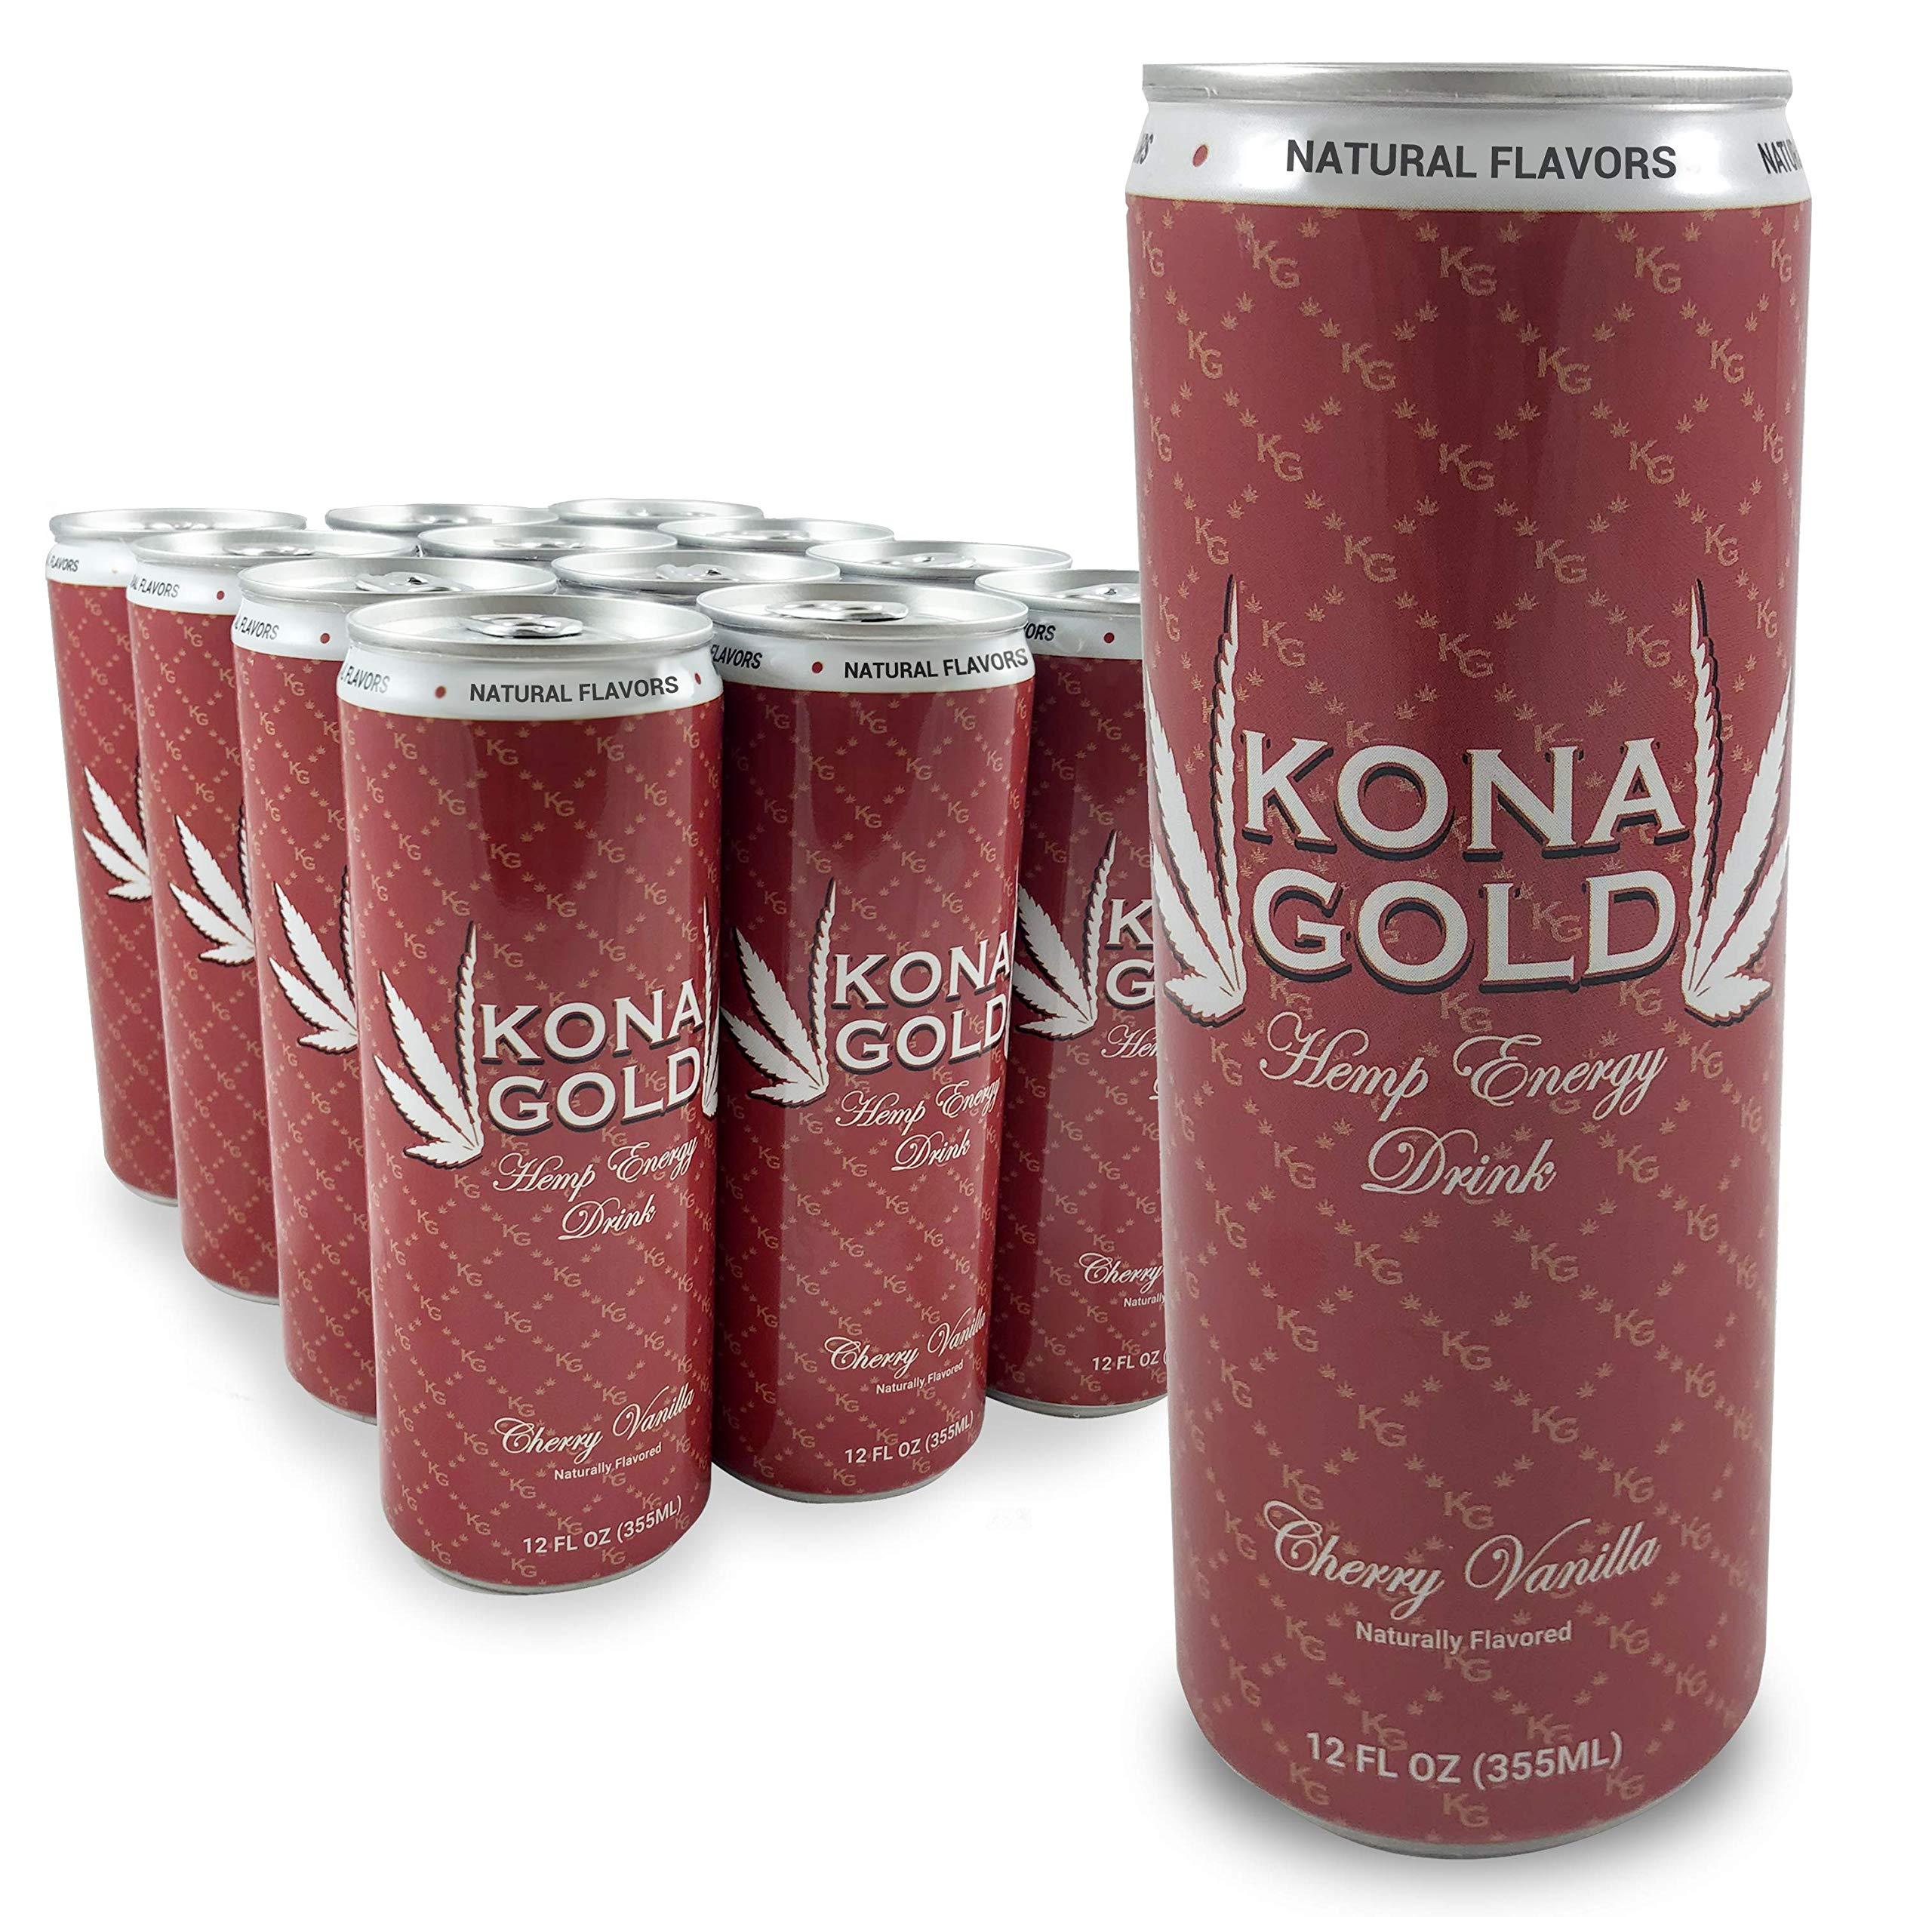 Kona Gold Cherry Vanilla Hemp Energy Drink 12.0 Fluid Ounces